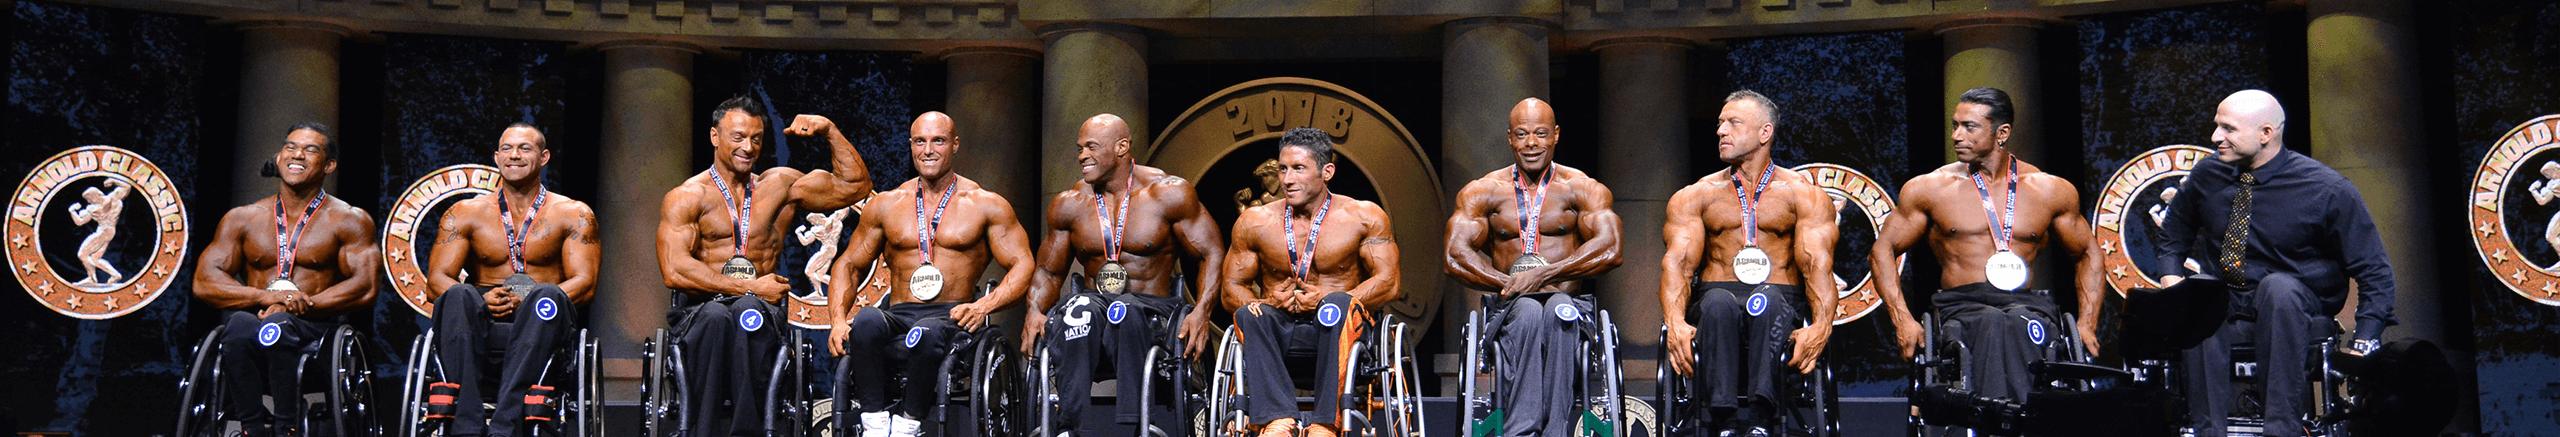 Handicap Bodybuilding Competition | Wheelchair Bodybuilding